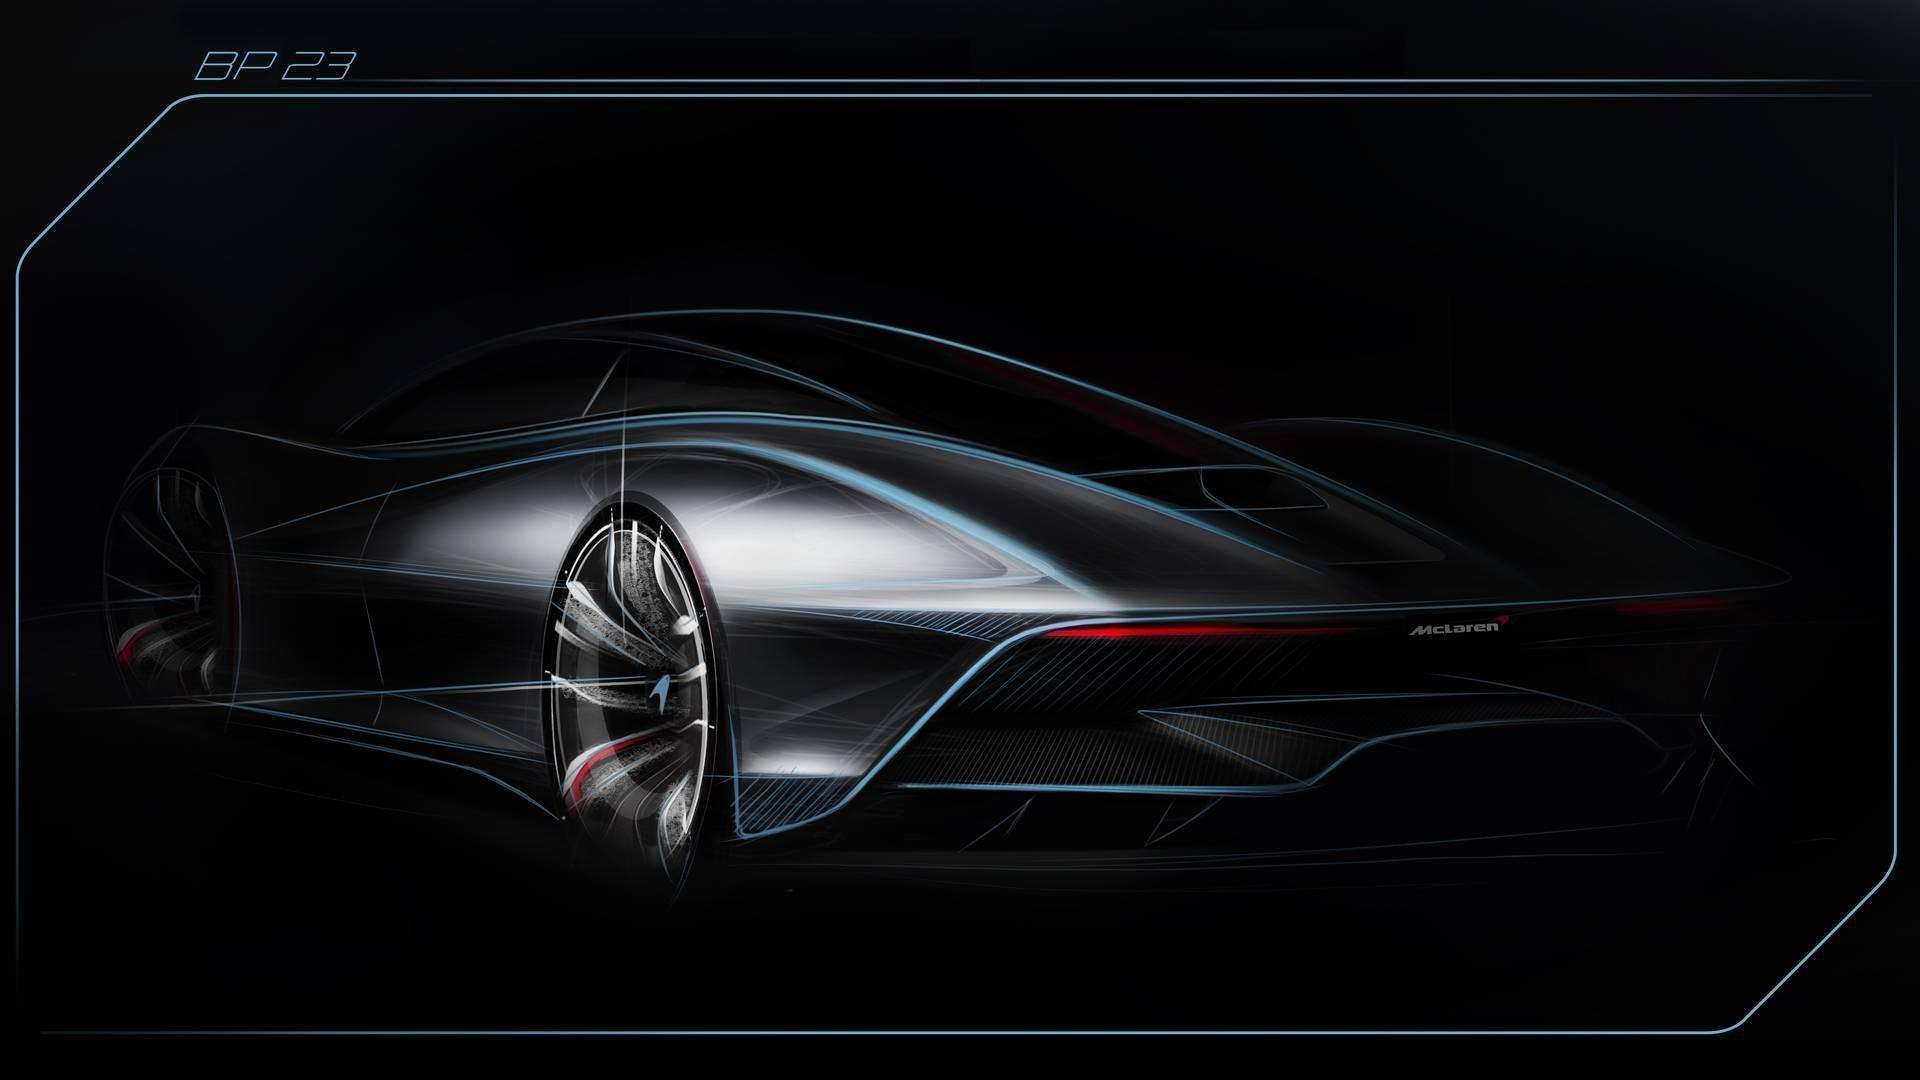 McLaren Hyper-GT : Jusqu'à 400 km/h en vitesse de pointe !